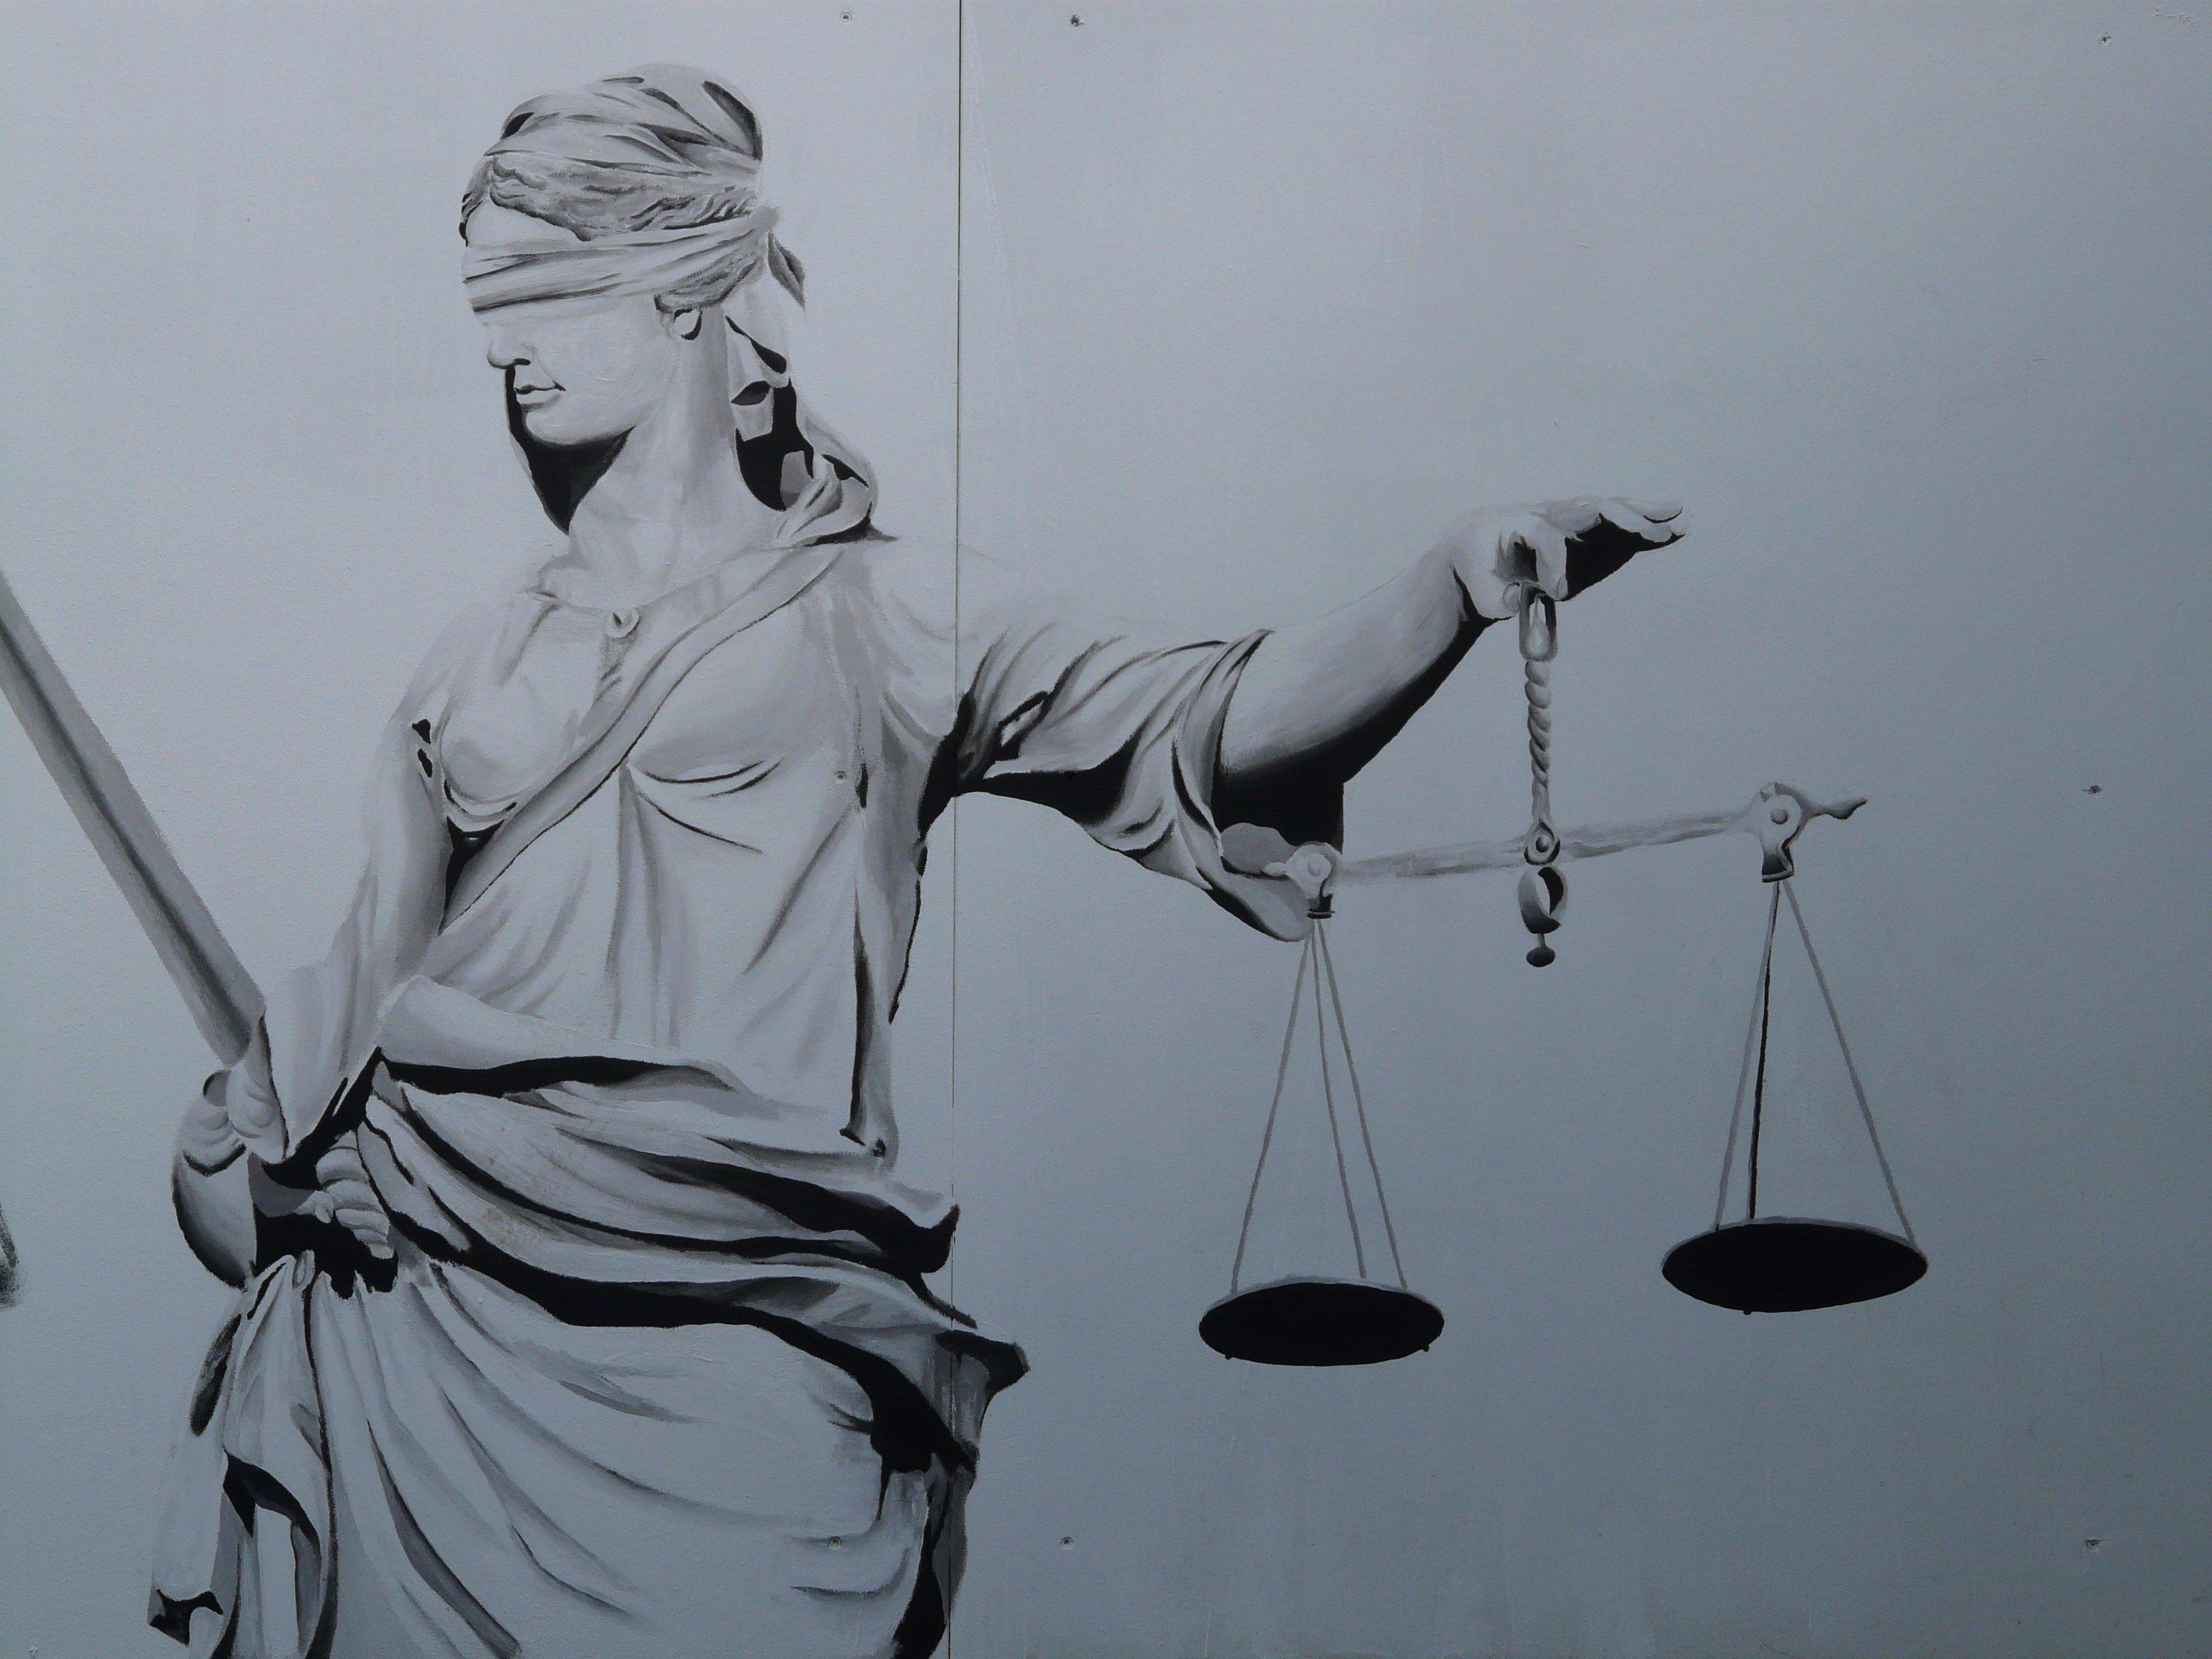 justice_judgmental_justitia